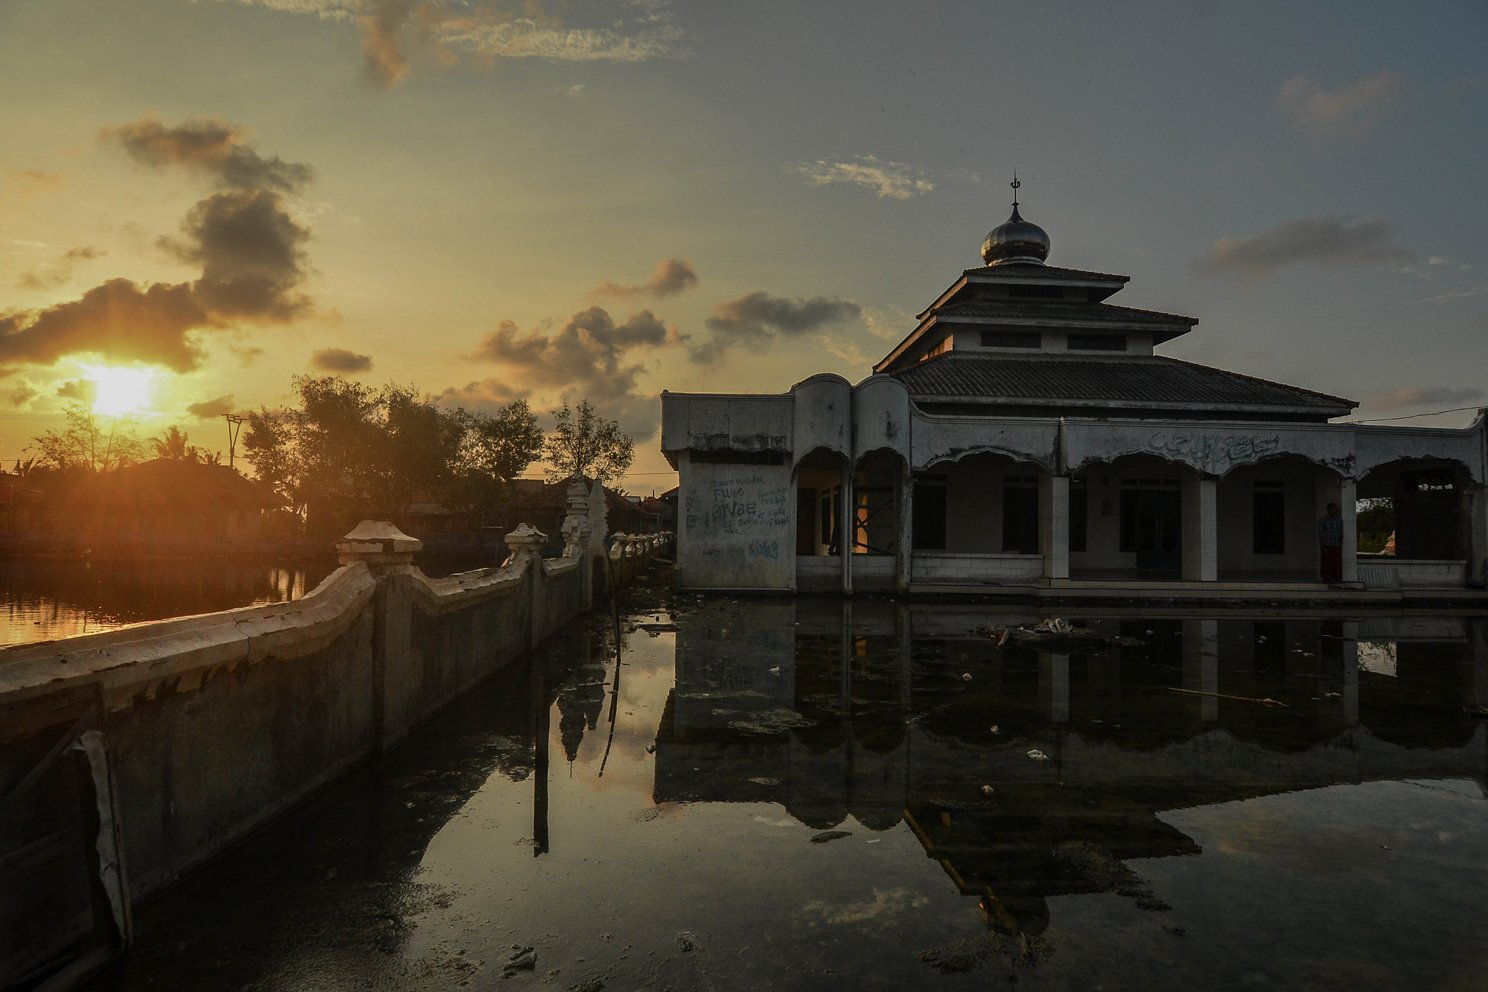 Halaman masjid tergenang luapan air laut di Kampung Beting, Desa Pantai Bahagia, Kecamatan Muara Gembong, Kabupaten Bekasi, Jawa Barat, Selasa (26/11/2019).